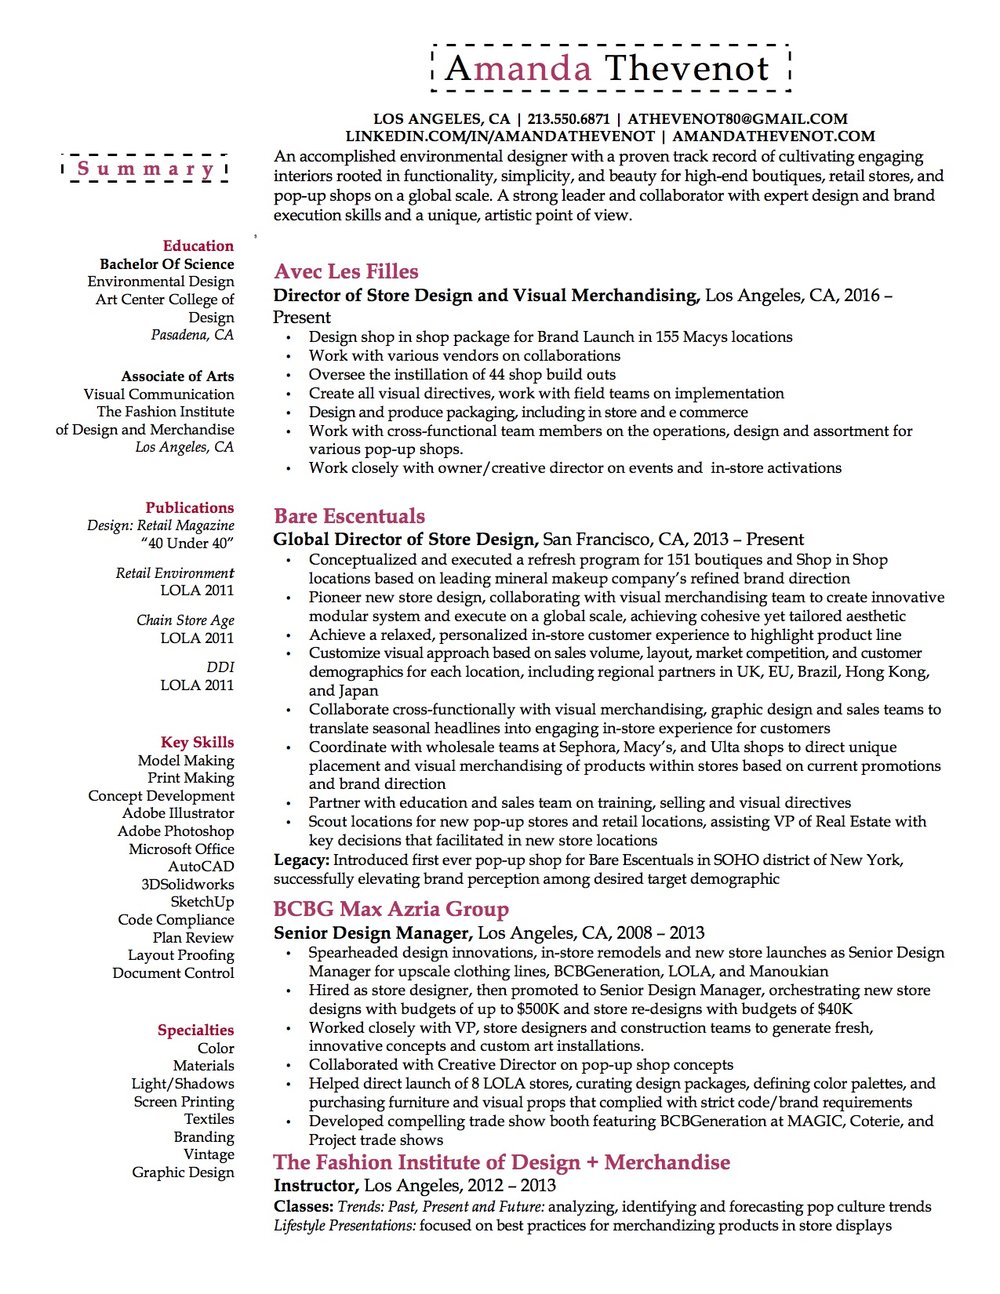 Resume — Amanda Thevenot